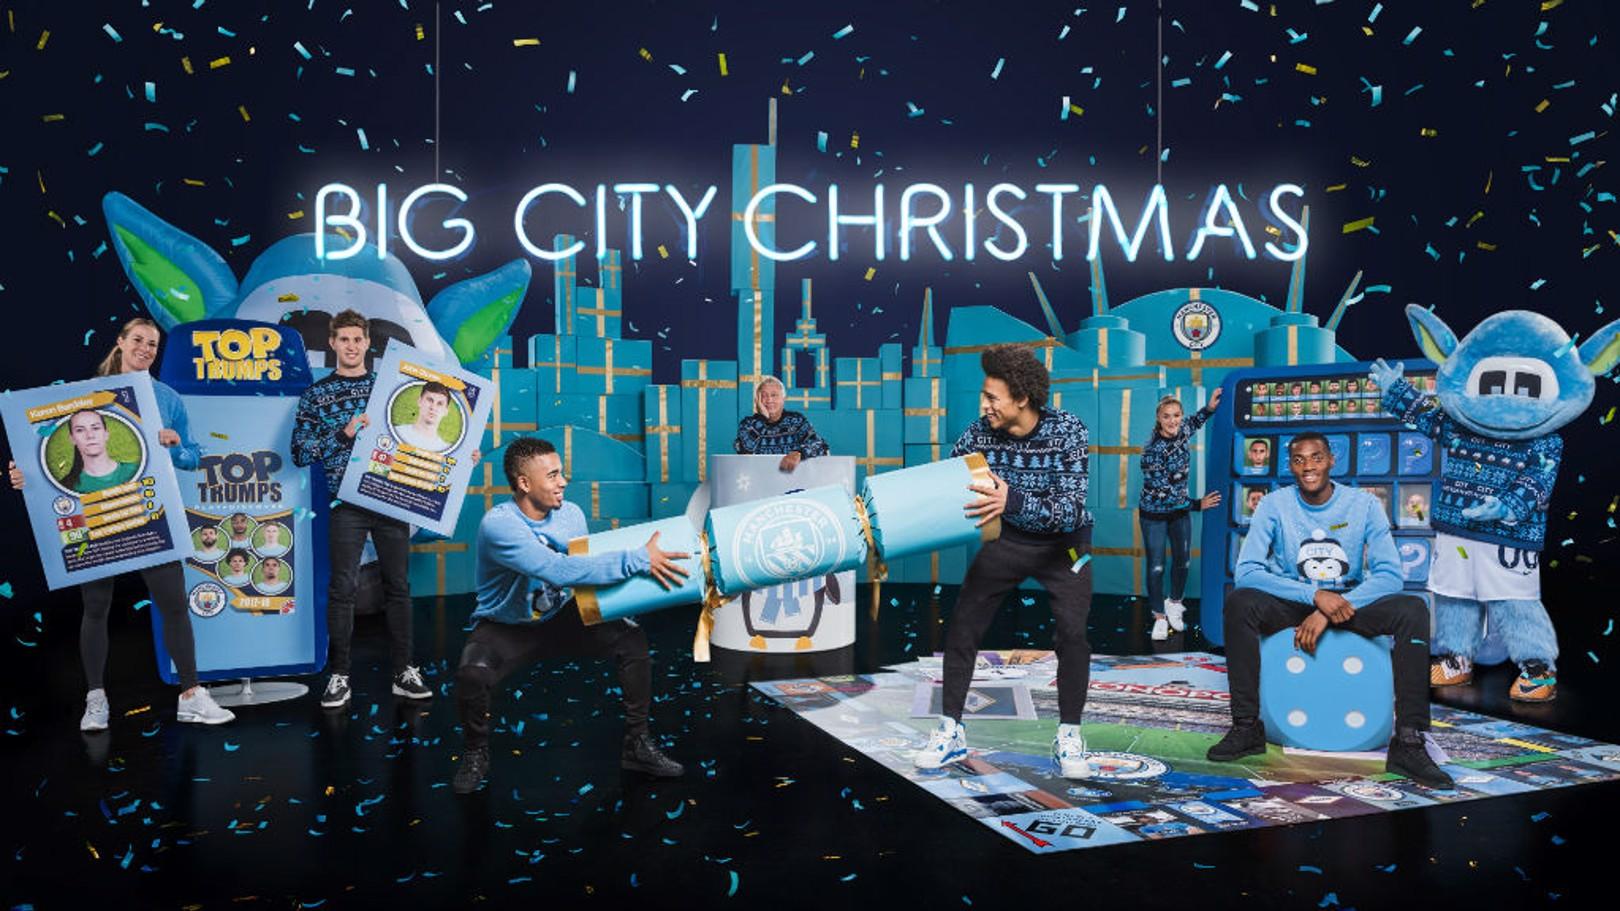 CELEBRATION: Big City Christmas